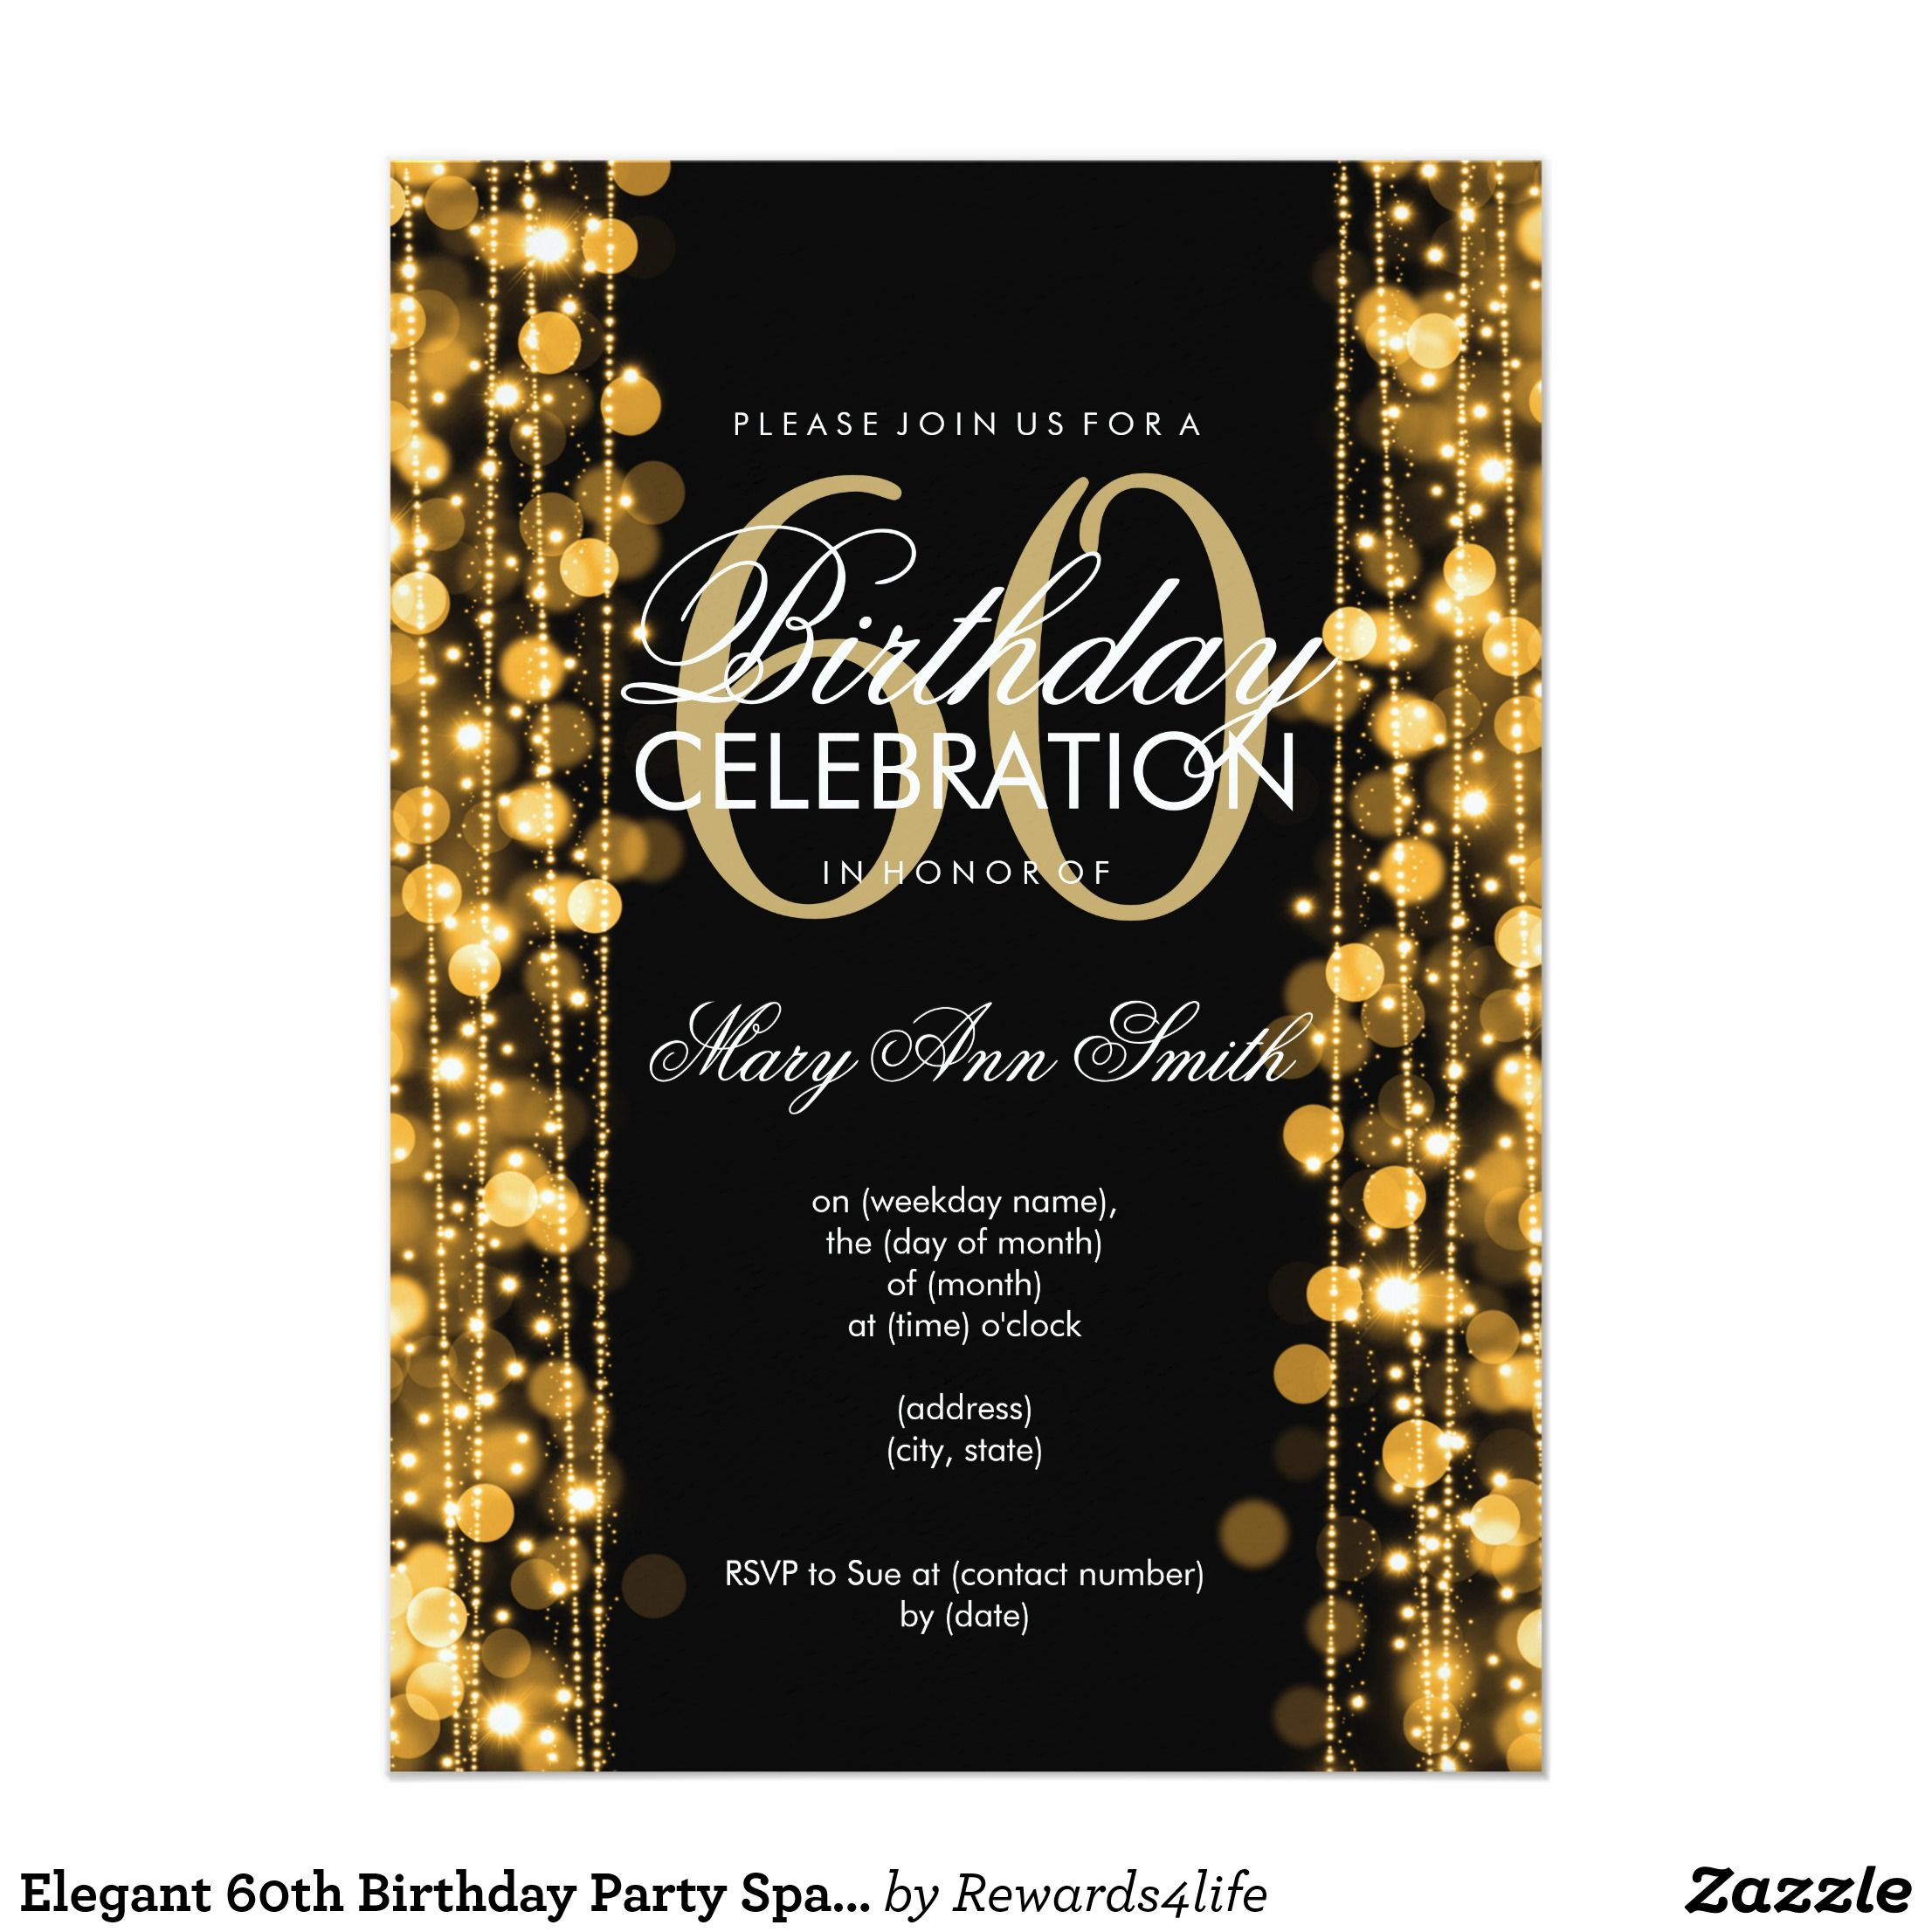 Elegant 60th Birthday Party Sparkles Gold Card